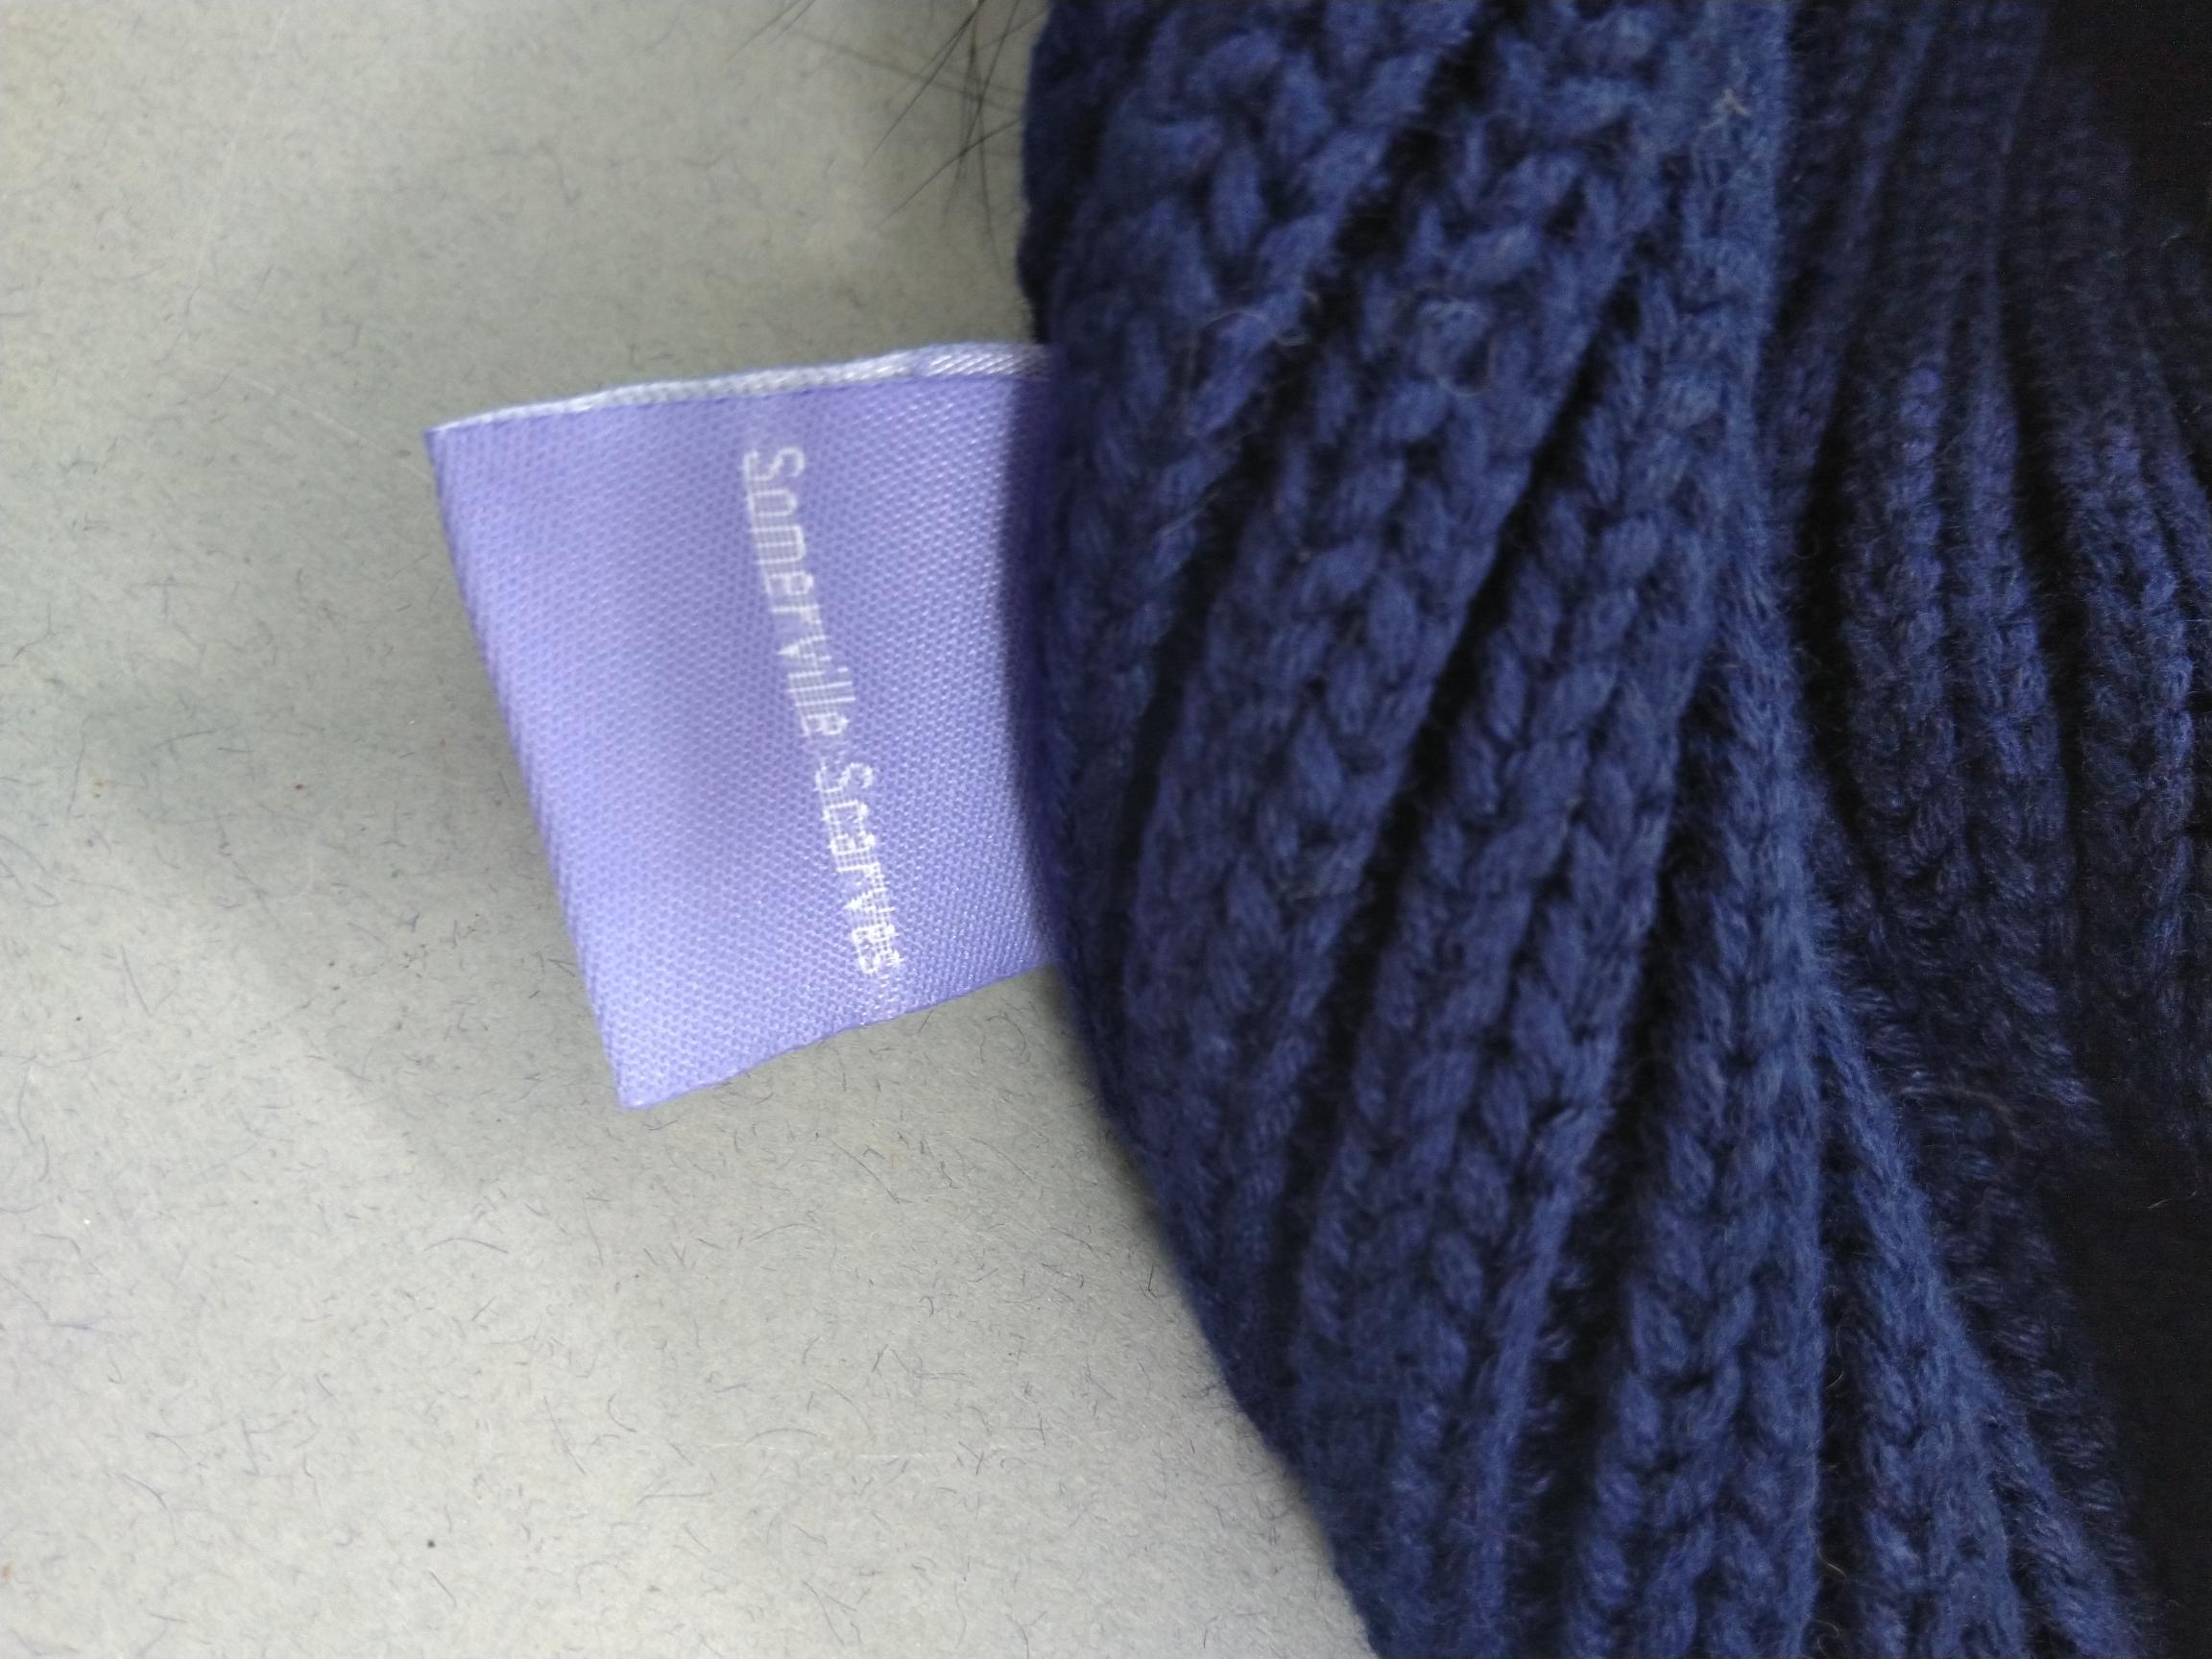 Job Lot Of Sommerville Scarves 6 Black & 3 Navy With Fur Pom Poms Brand New